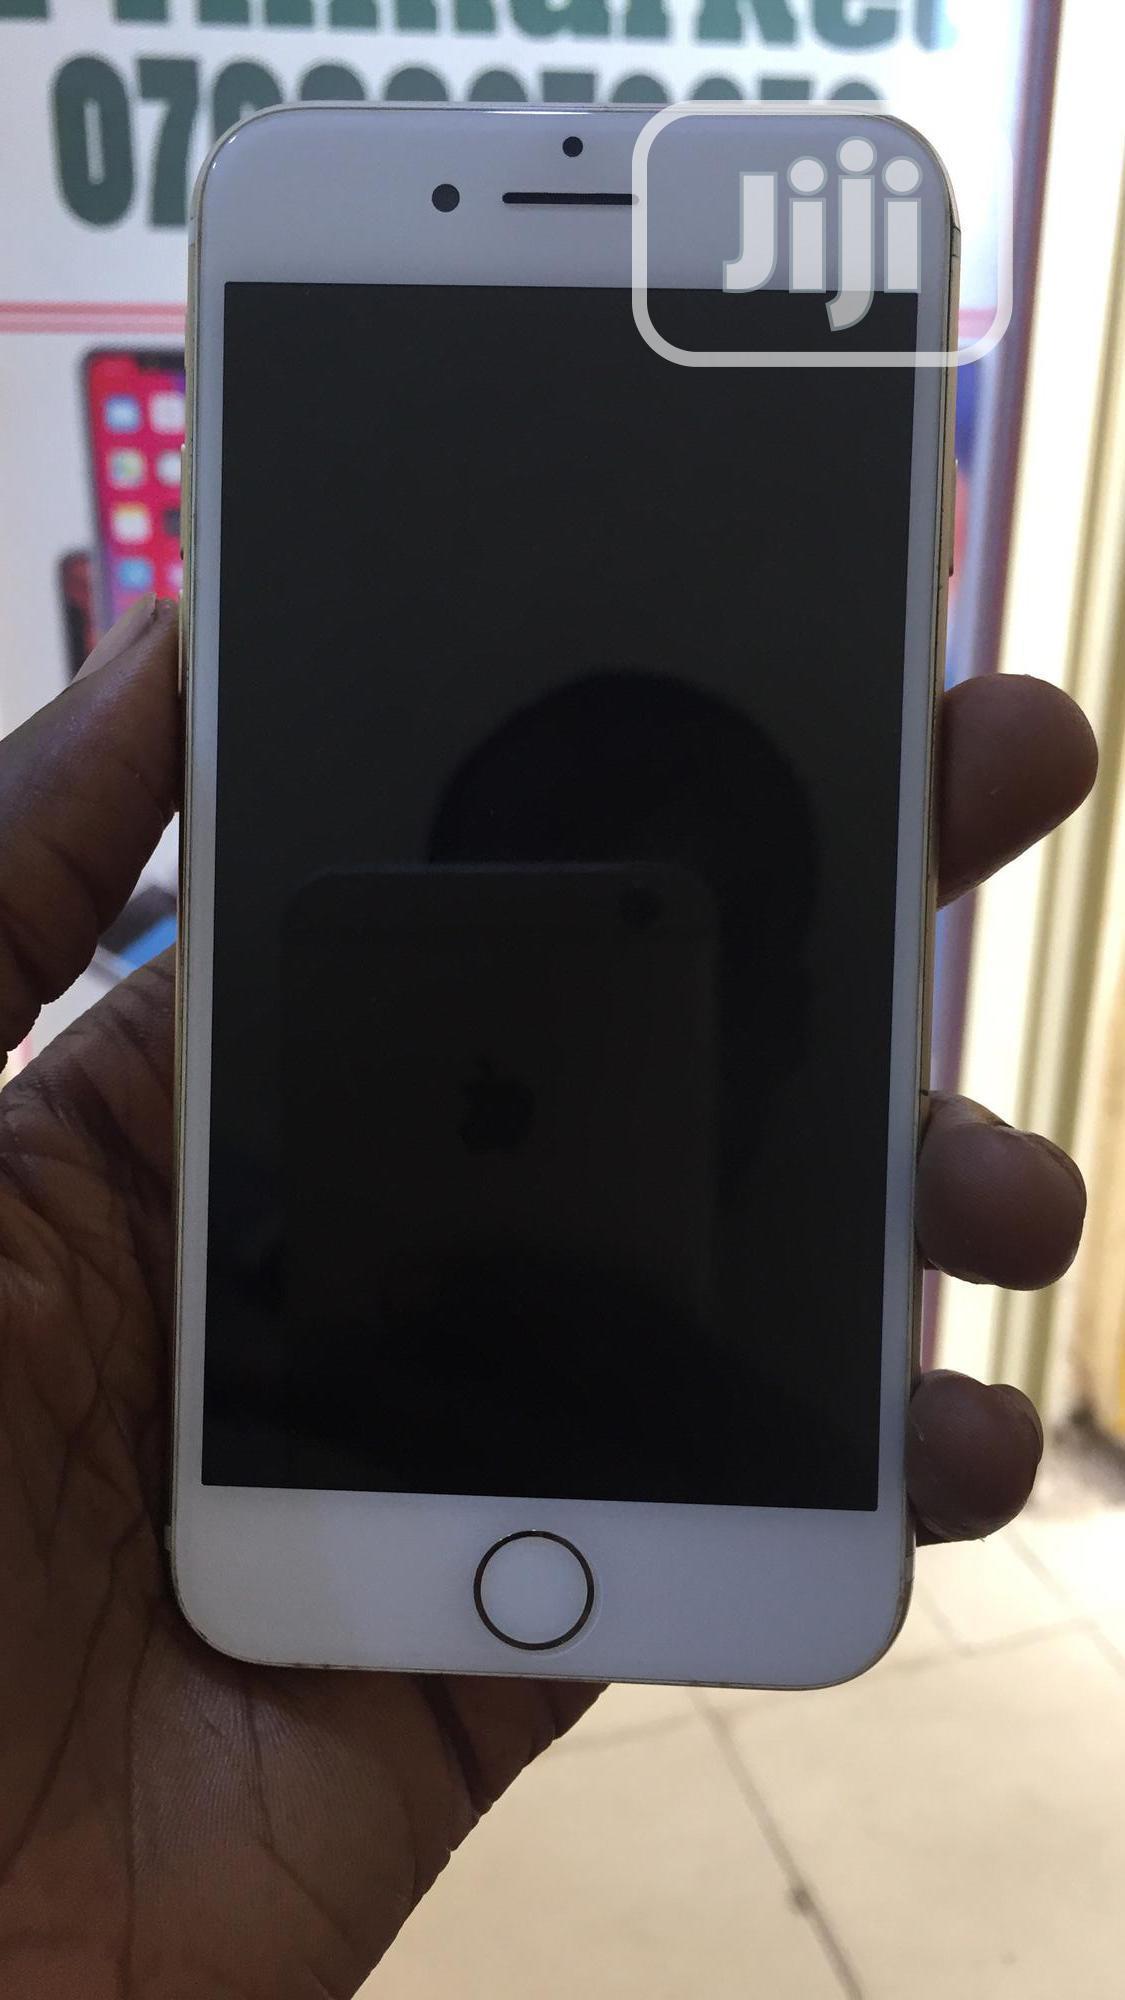 Apple iPhone 7 128 GB Silver | Mobile Phones for sale in Benin City, Edo State, Nigeria